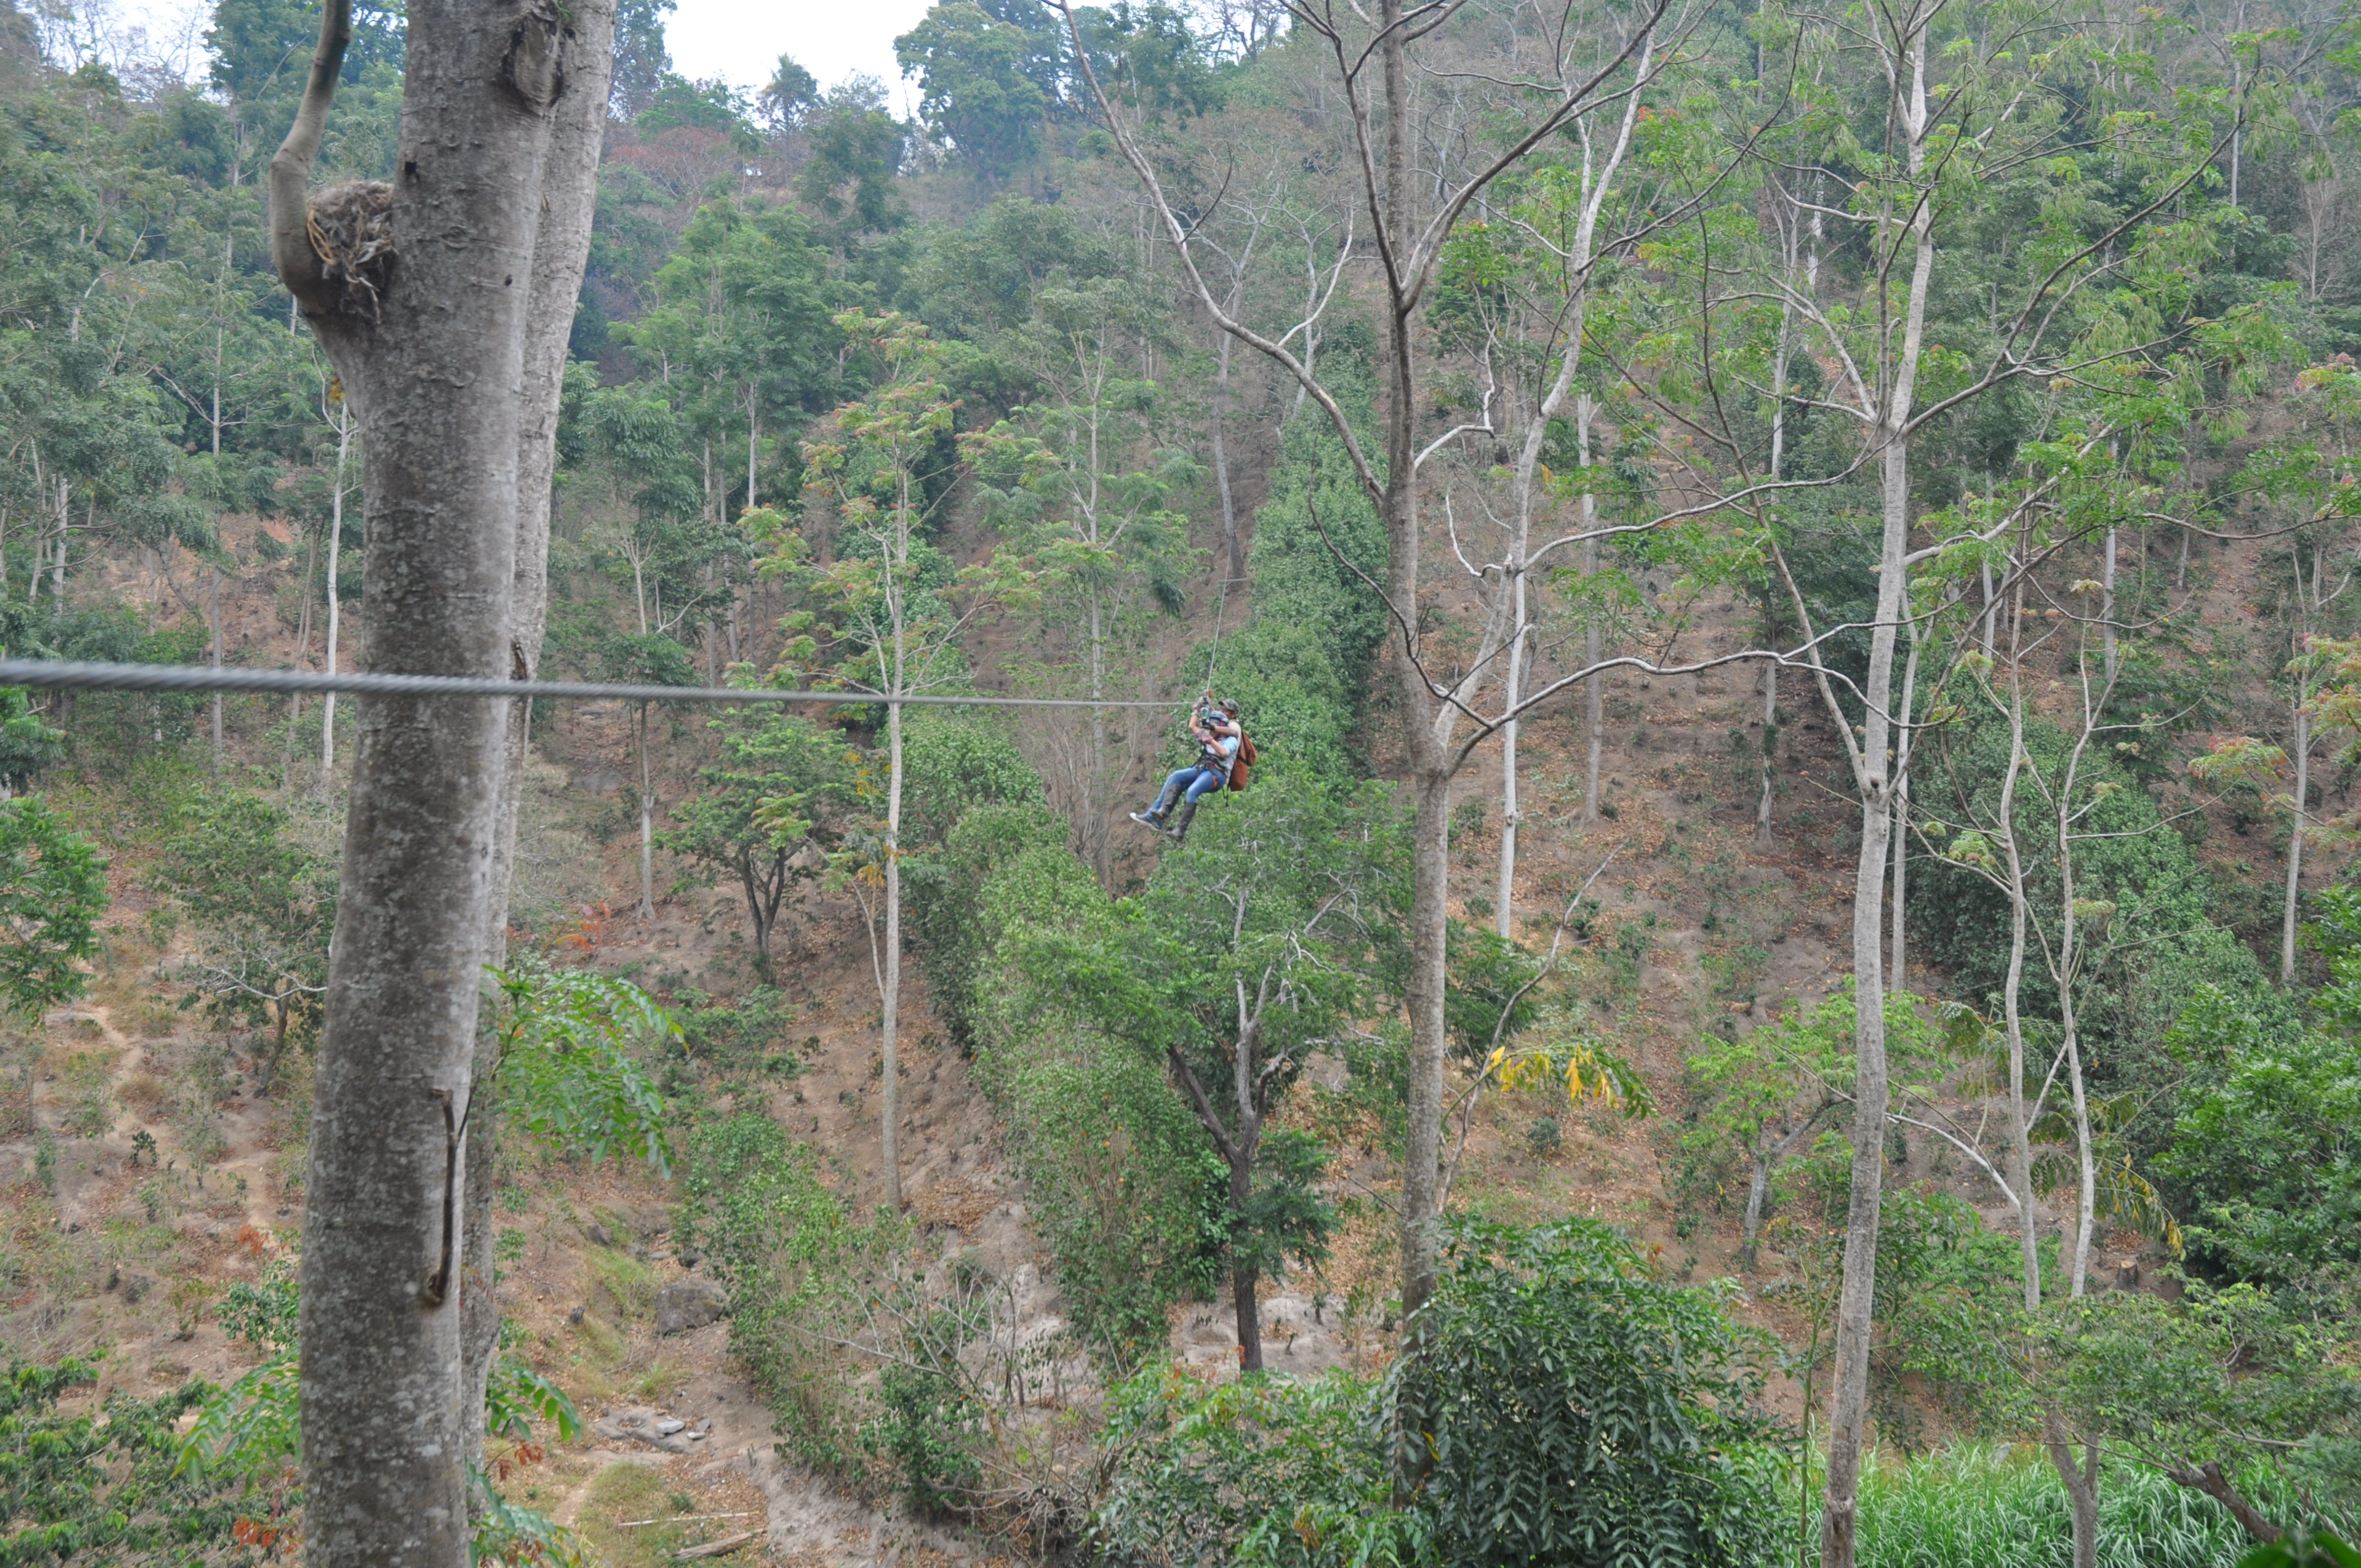 Canopy Adventure. Zip through the tropical forest canopy in Apaneca! & Canopy Adventure. Zip through the tropical forest canopy in ...